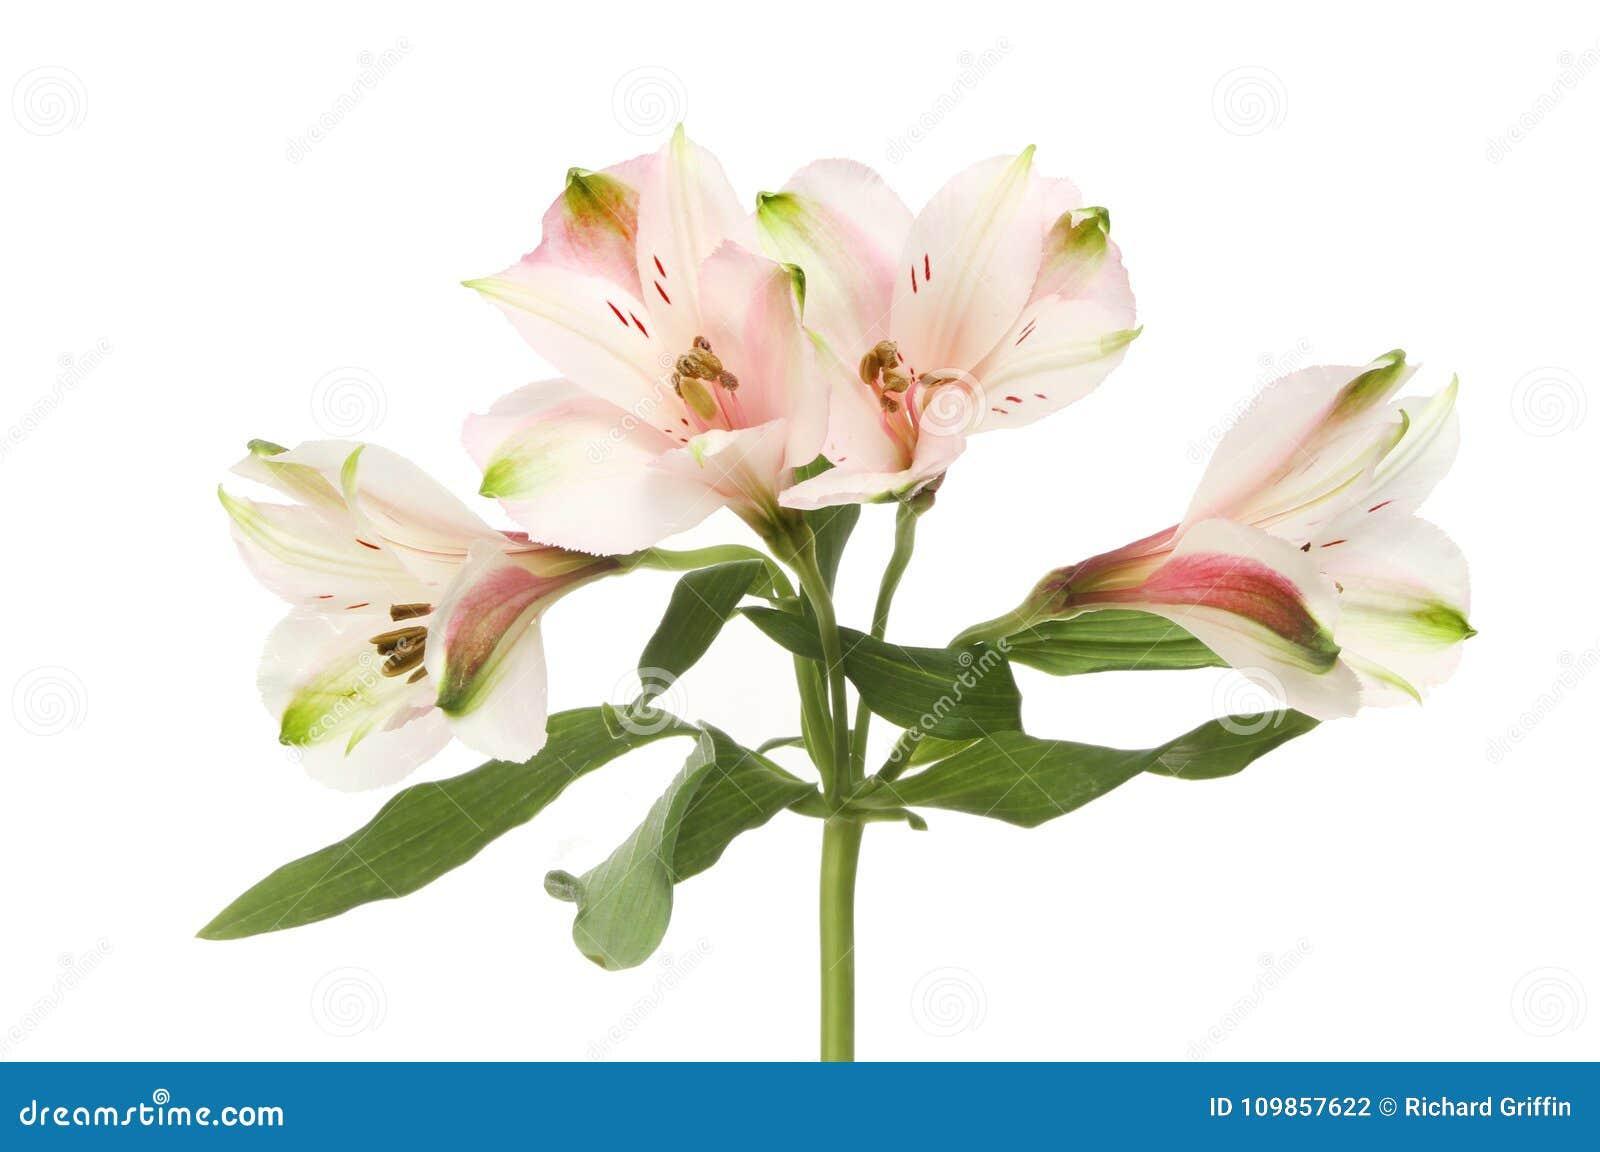 Alstroemeria flowers and foliage